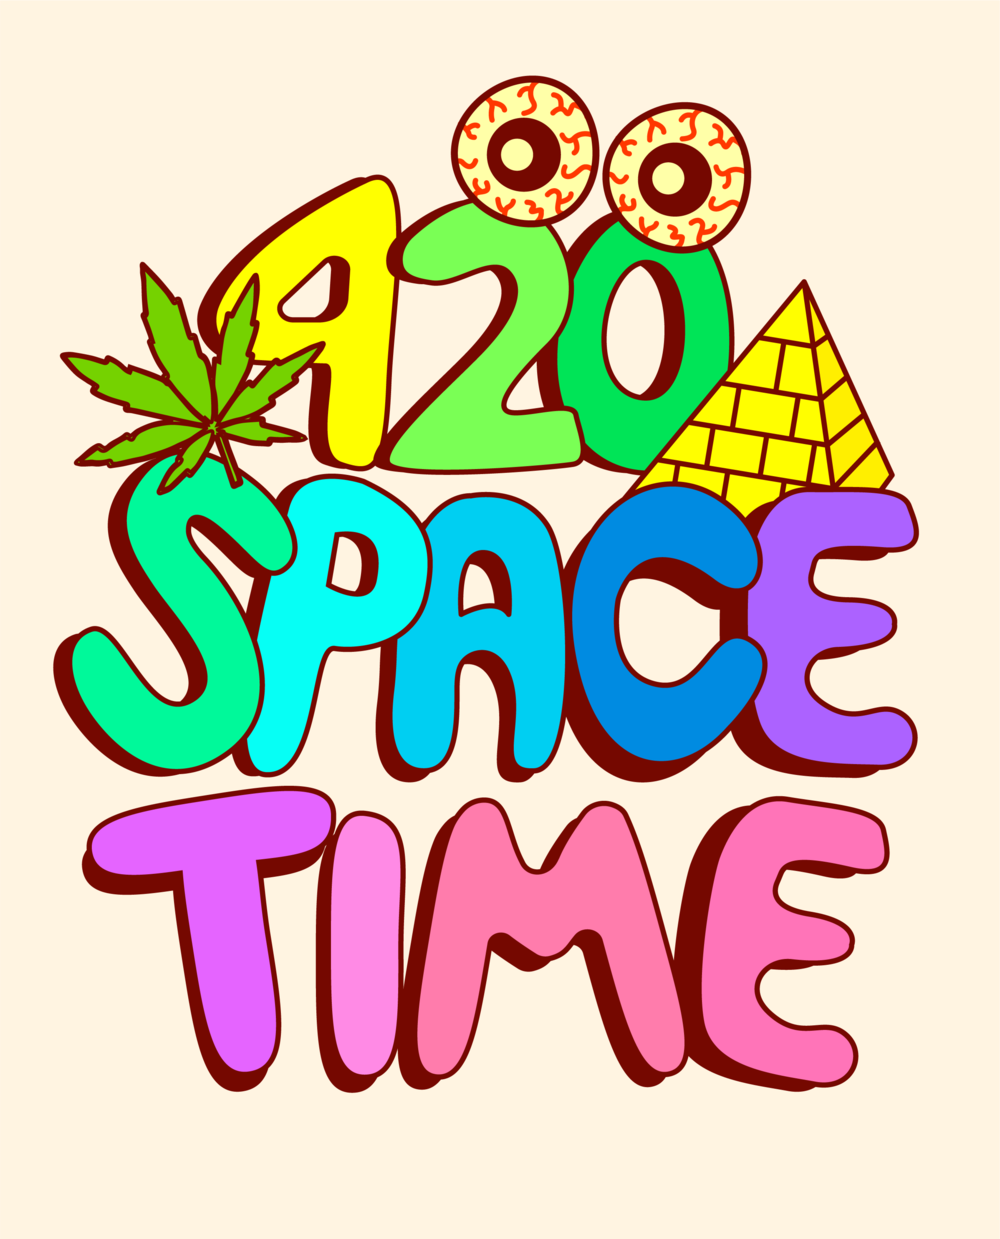 T-SHIRT DESIGN FOR @420SPACETIME